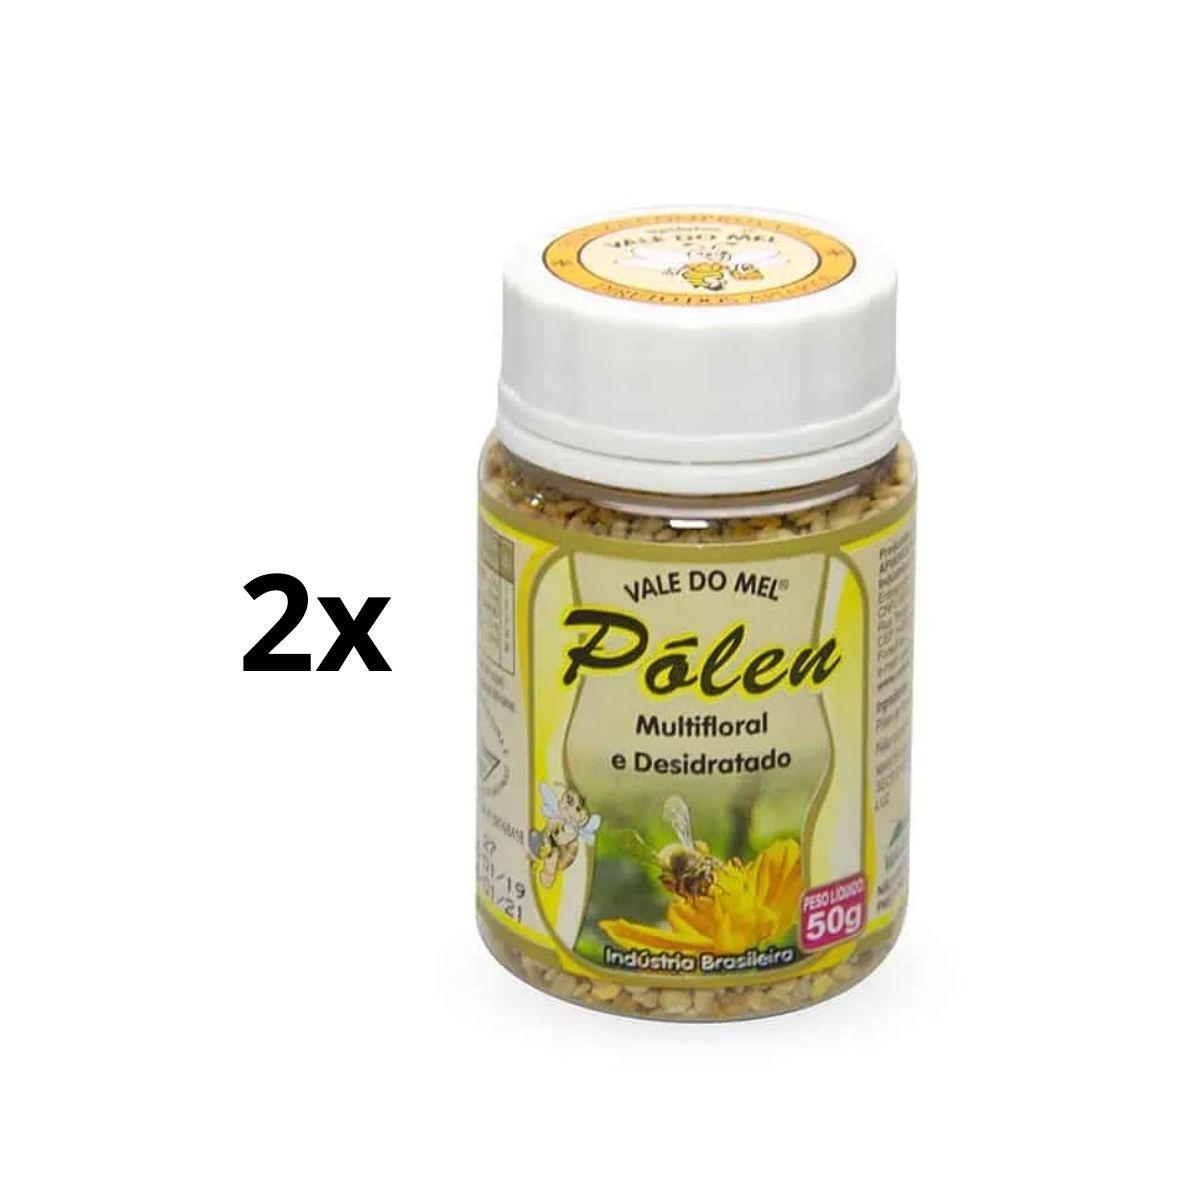 Kit 2 Polen Multifloral Desidratado Sem Glúten 50g - Vale Do Mel